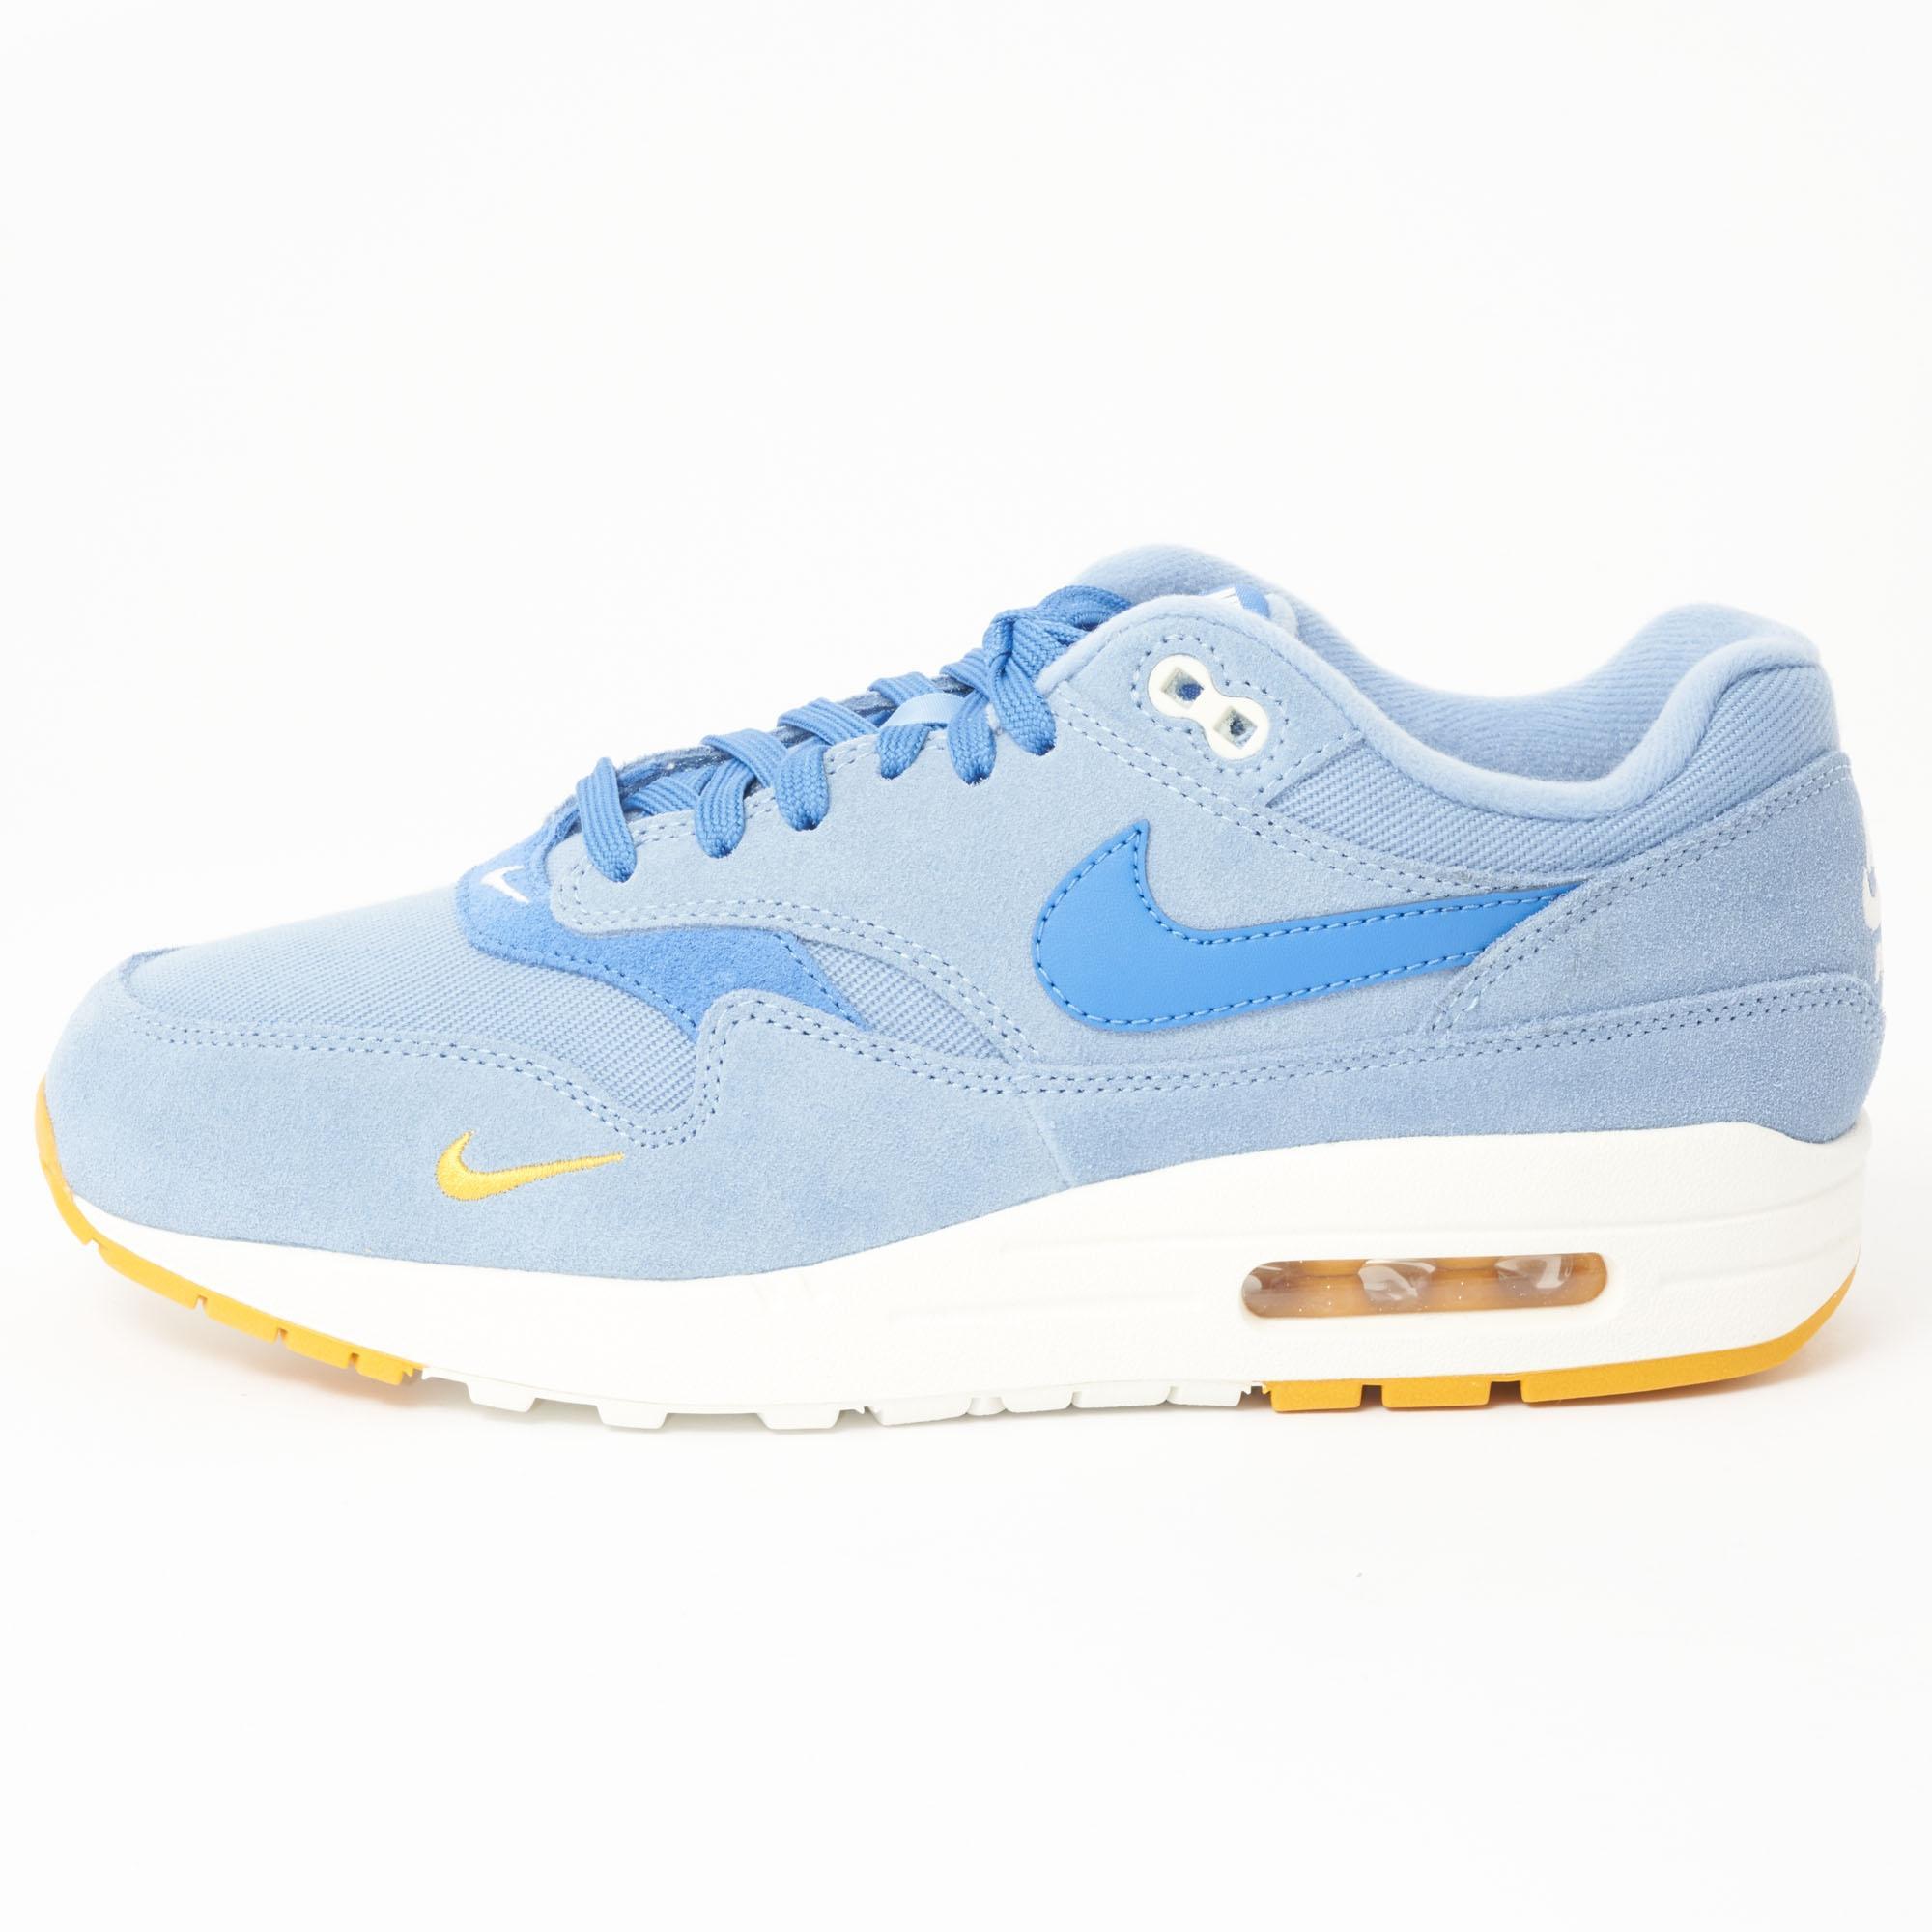 best cheap be869 ba667 Nike Air Max 1 Premium - Work Blue   Mountain Blue in Blue for Men ...